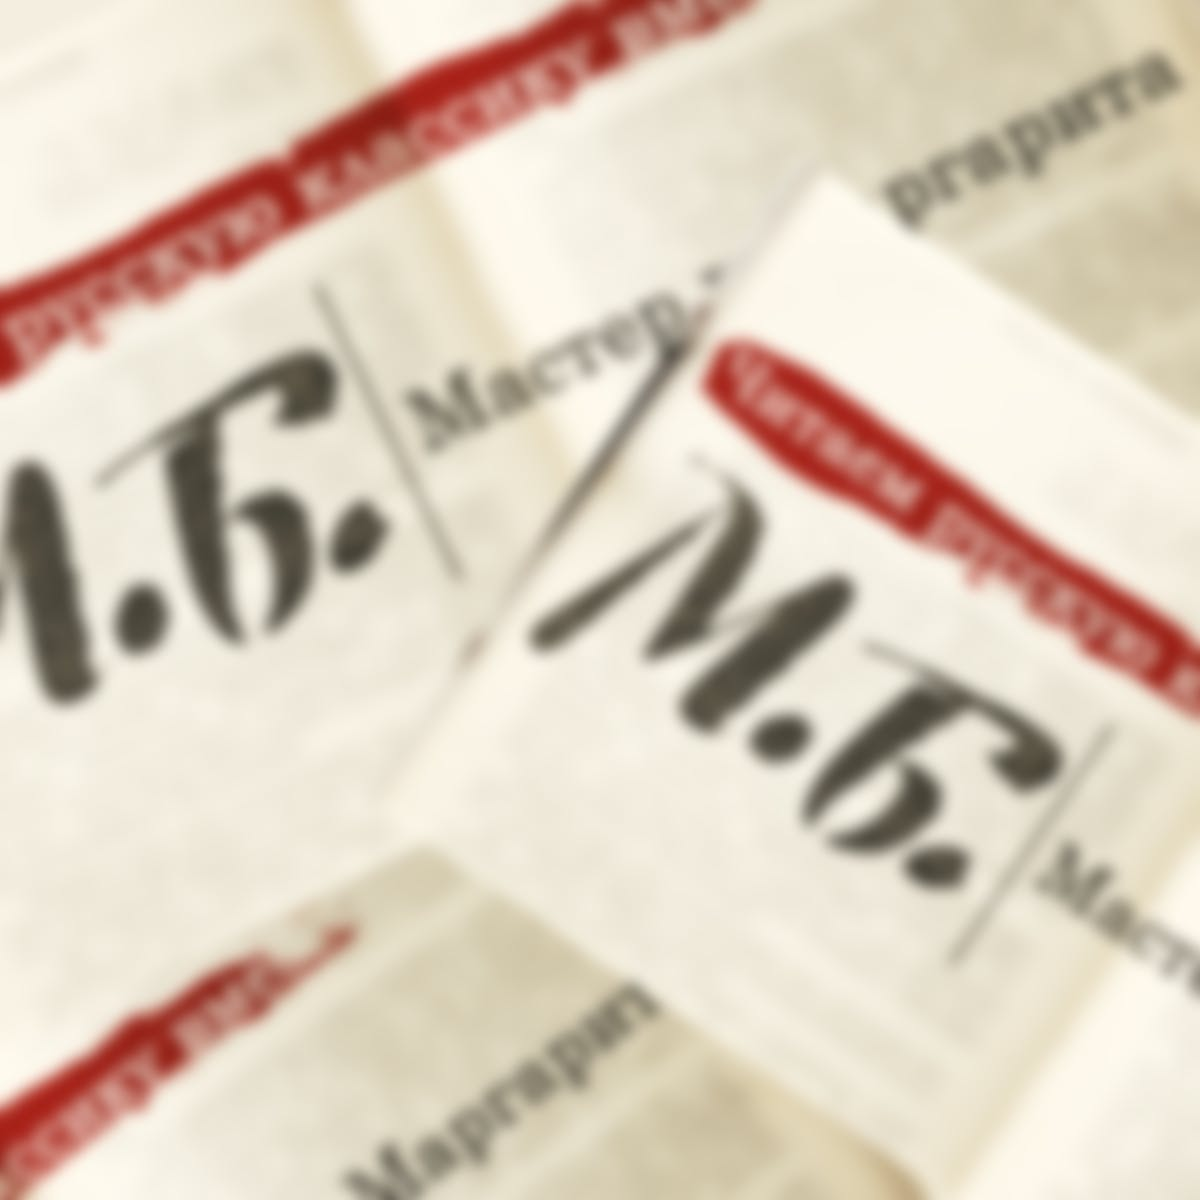 Читаем русскую классику вместе.  М. Булгаков «Мастер и Маргарита»